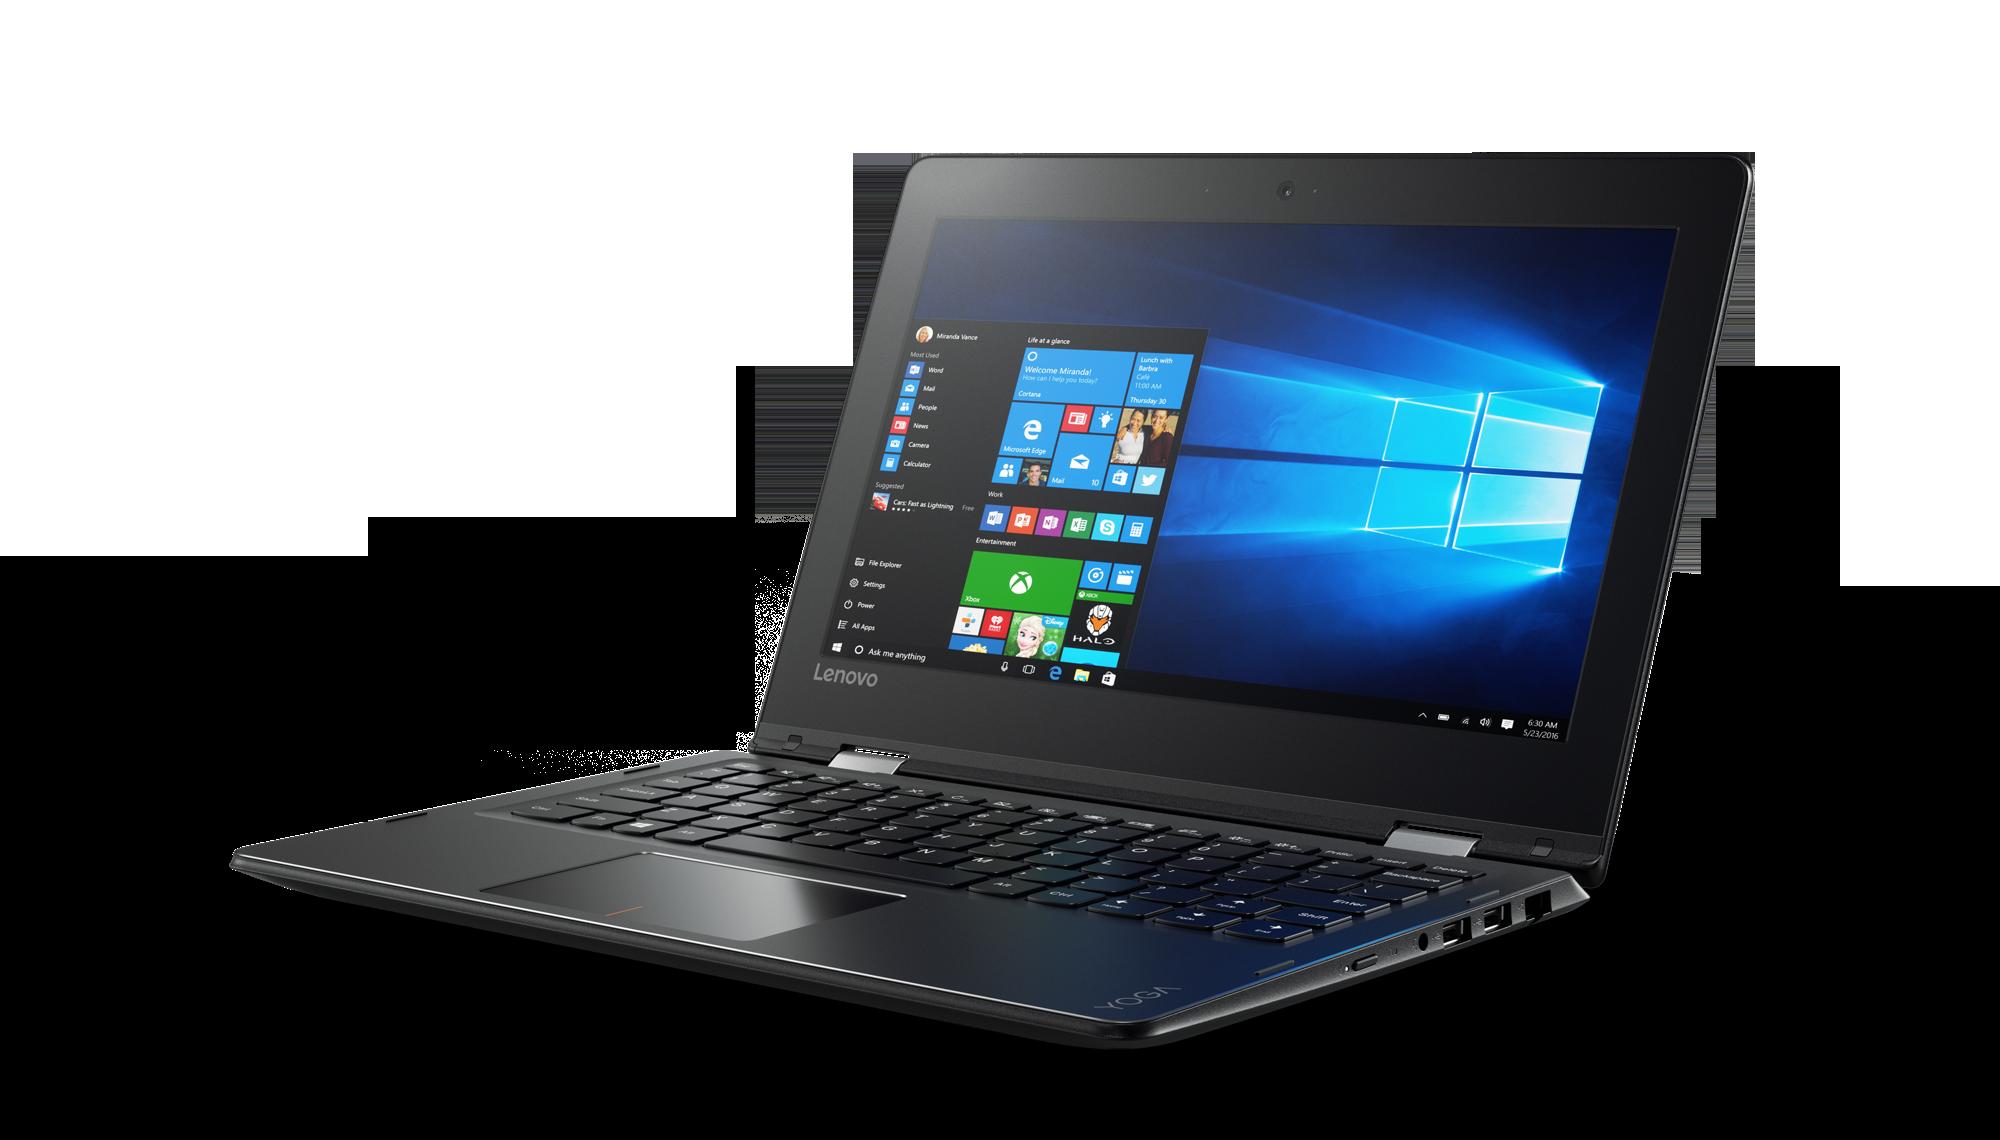 "Lenovo YOGA 310-11IAP Celeron-QC N3450 2,20GHz/4GB/32GB/11,6"" HD/IPS/AG/multitouch/WIN10 černá 80U20067CK"